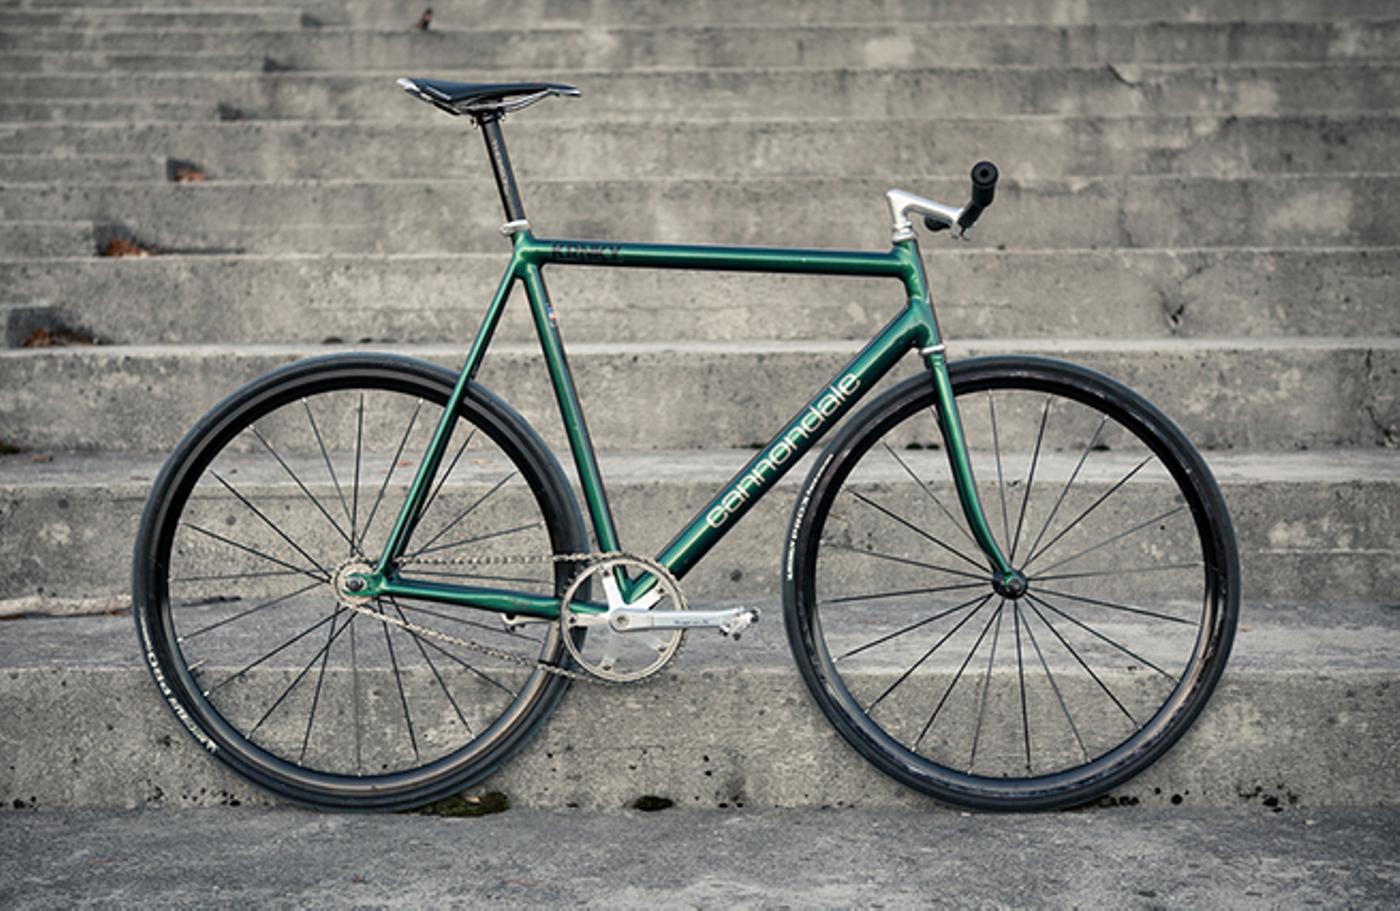 Kim Heikkinen: Green Cannondale Track